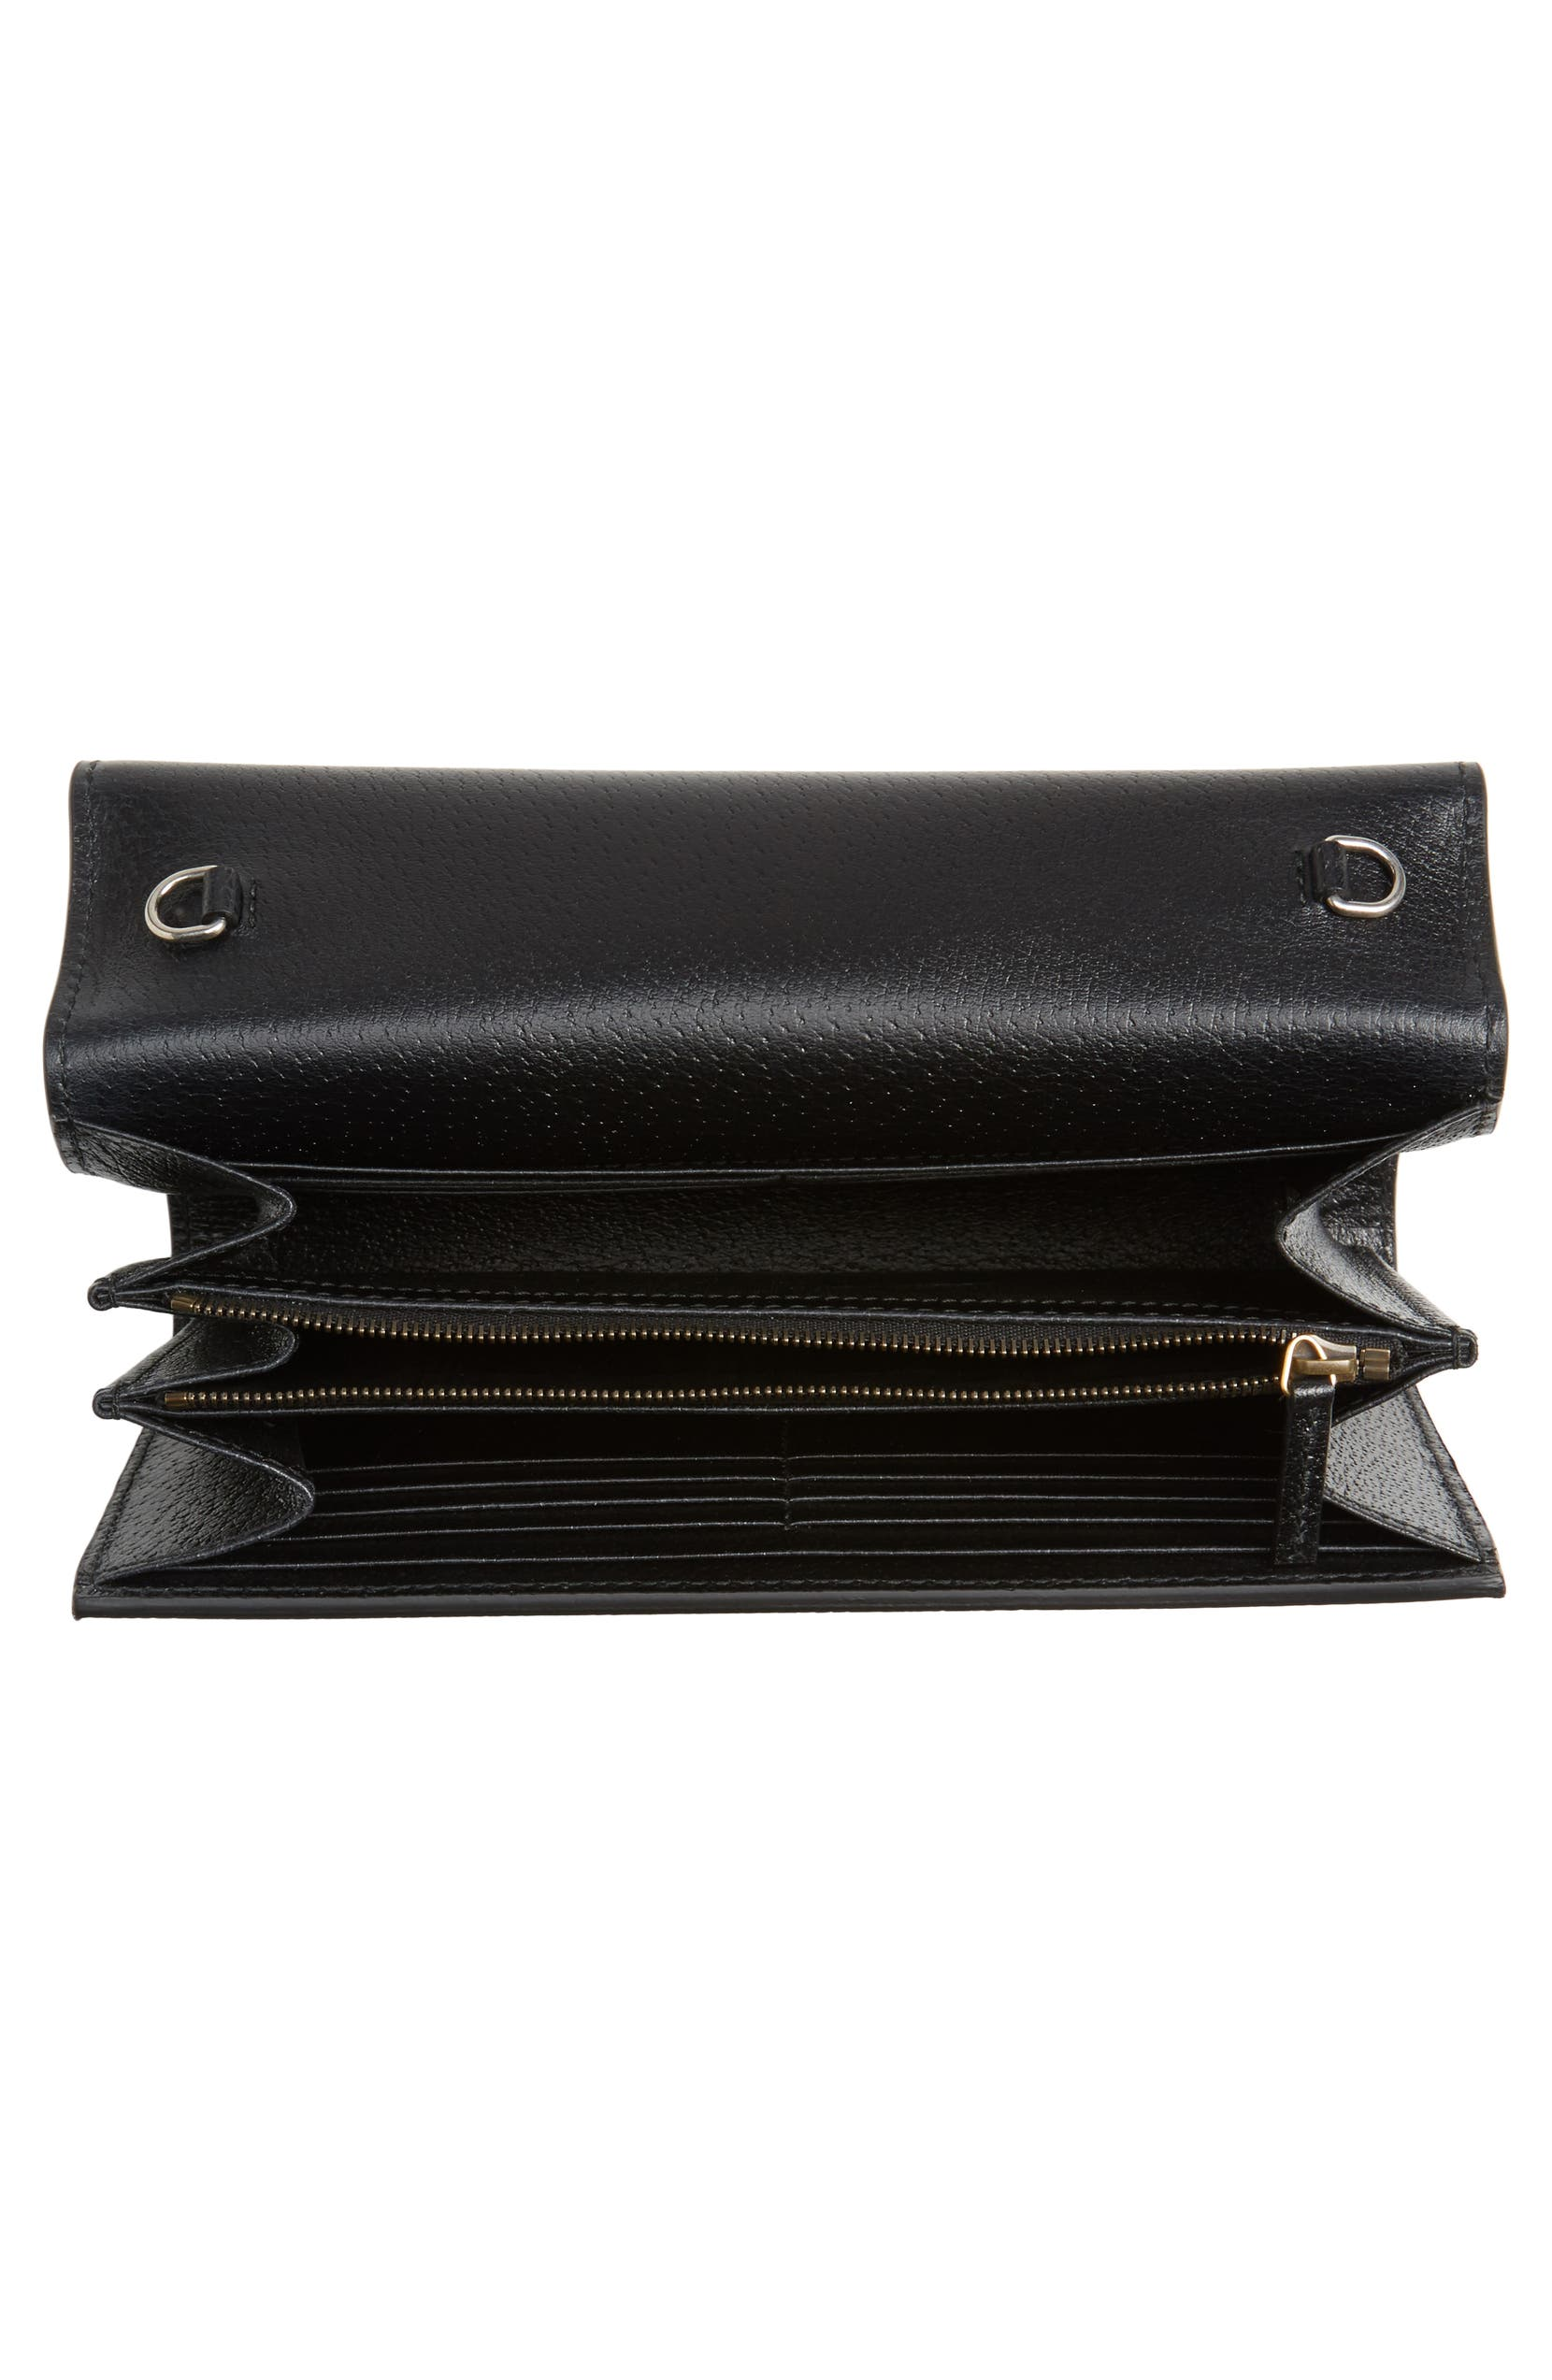 9f5974917fa Gucci Dionysus Web Stripe Leather Wallet on a Chain